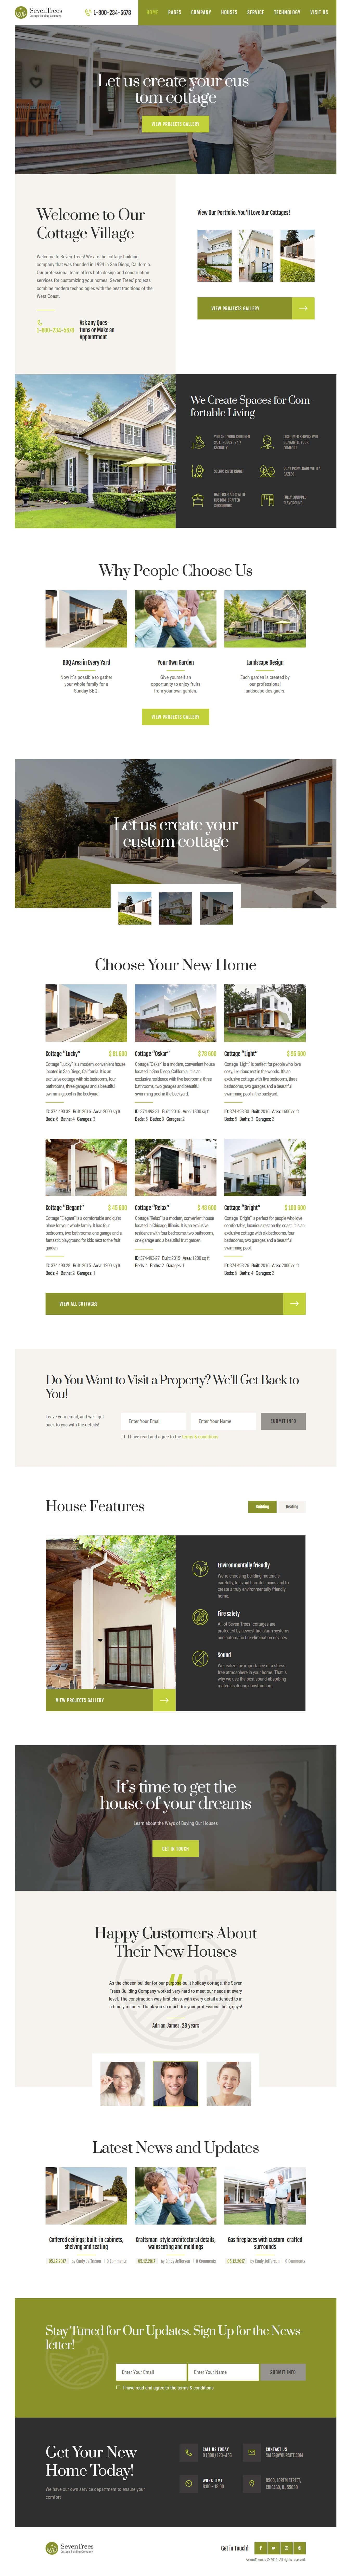 seventrees best premium home rental property wordpress theme - 10+ Best Premium Home Rental and Property WordPress Themes